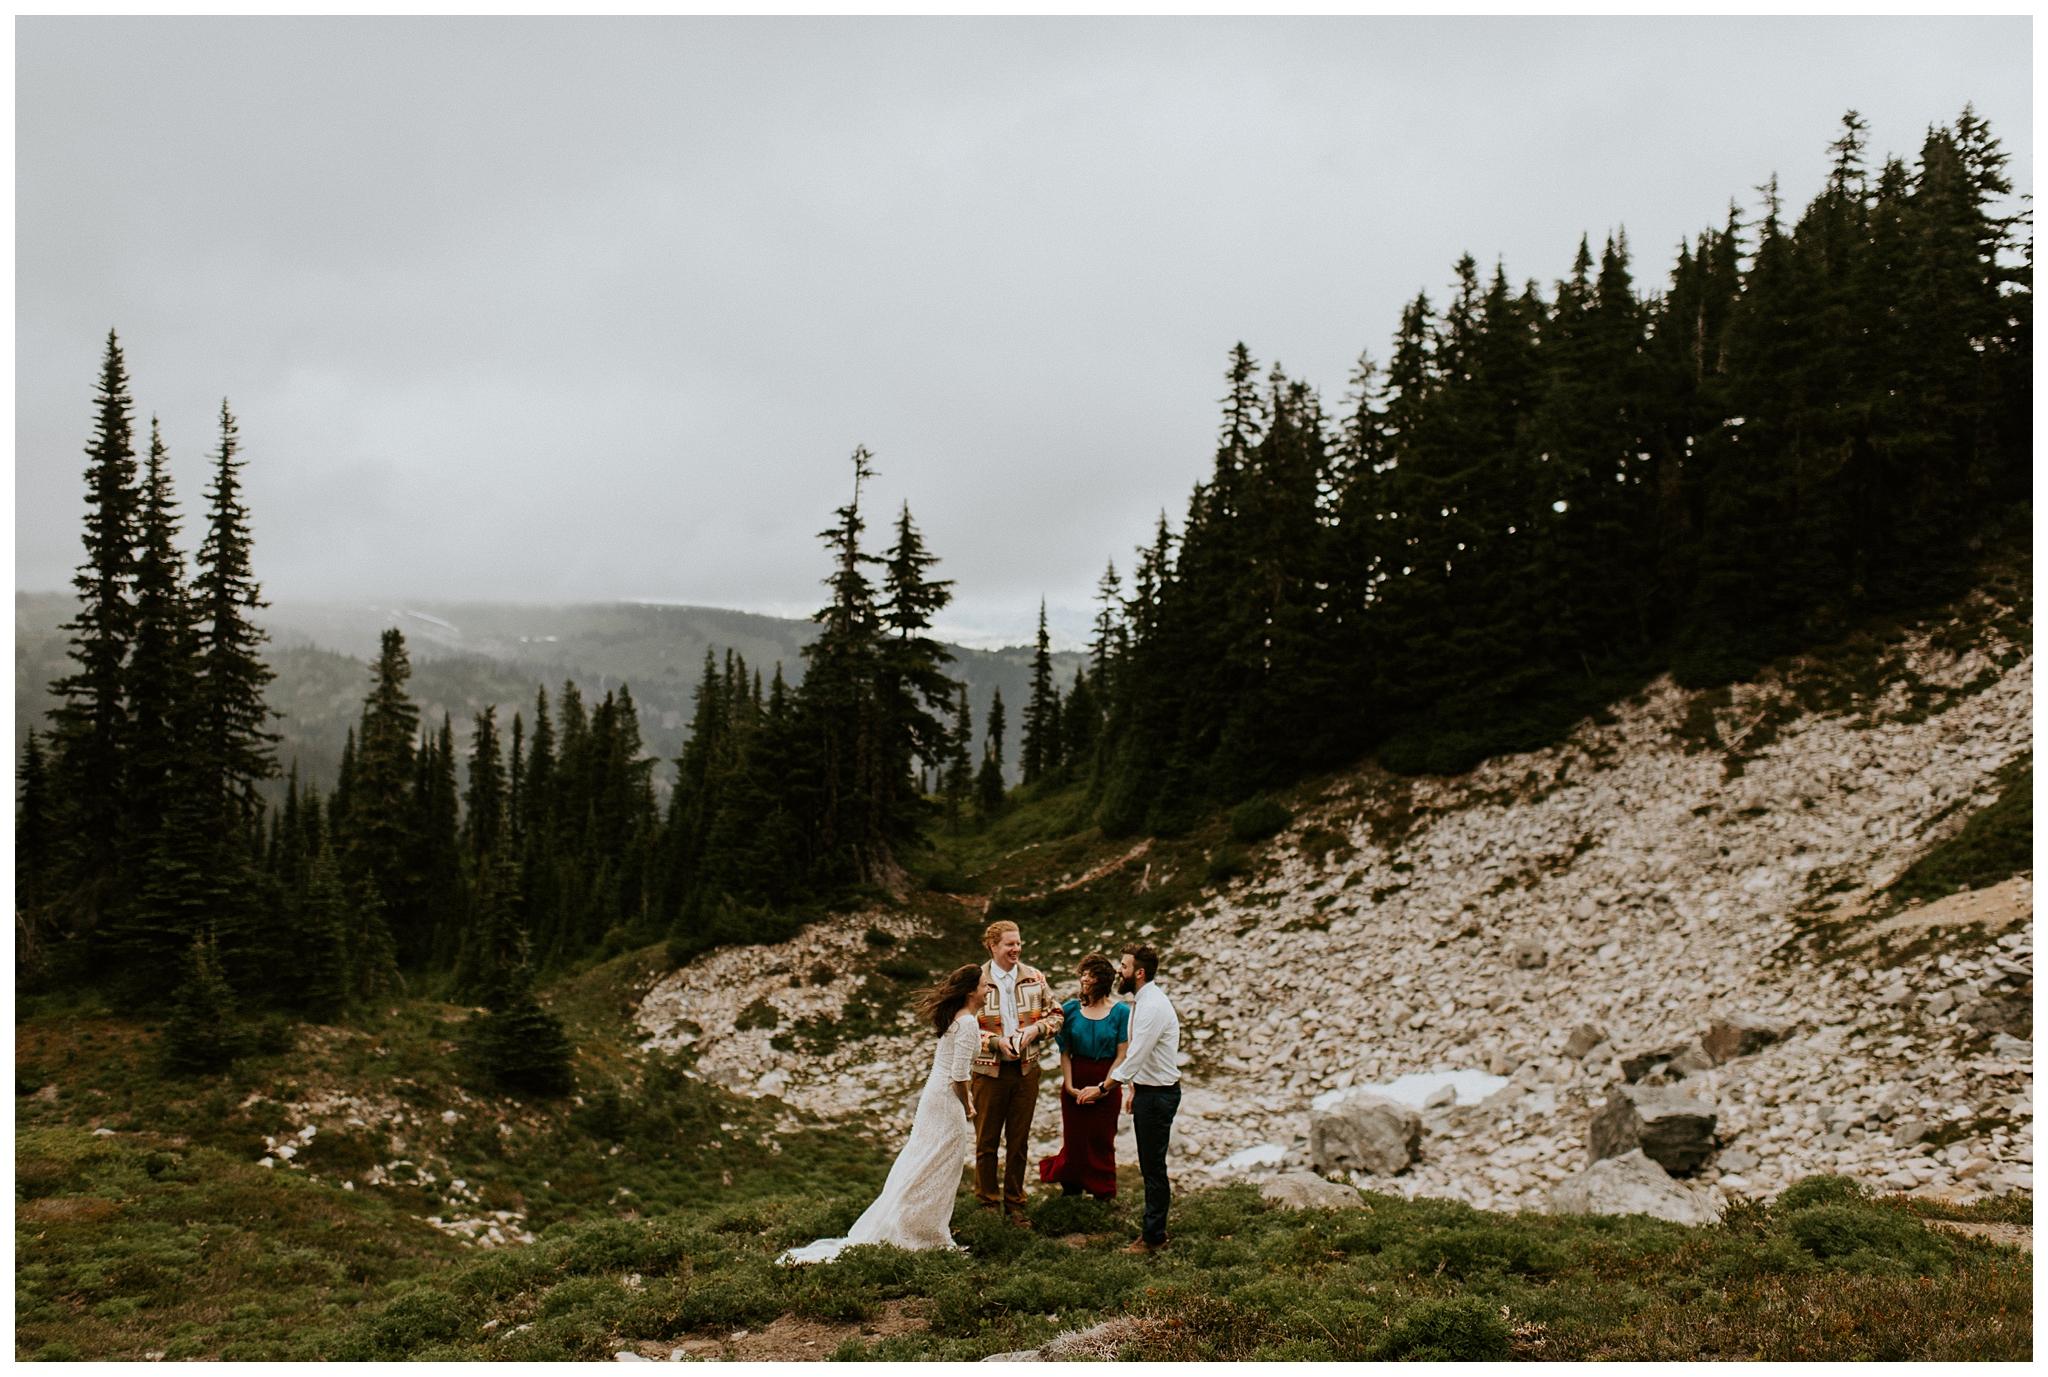 Pinnacle Peak Adventure Elopement at Mt. Rainier National Park by Seattle Elopement Photographer, Kamra Fuller Photography - Seattle Wedding Photographer